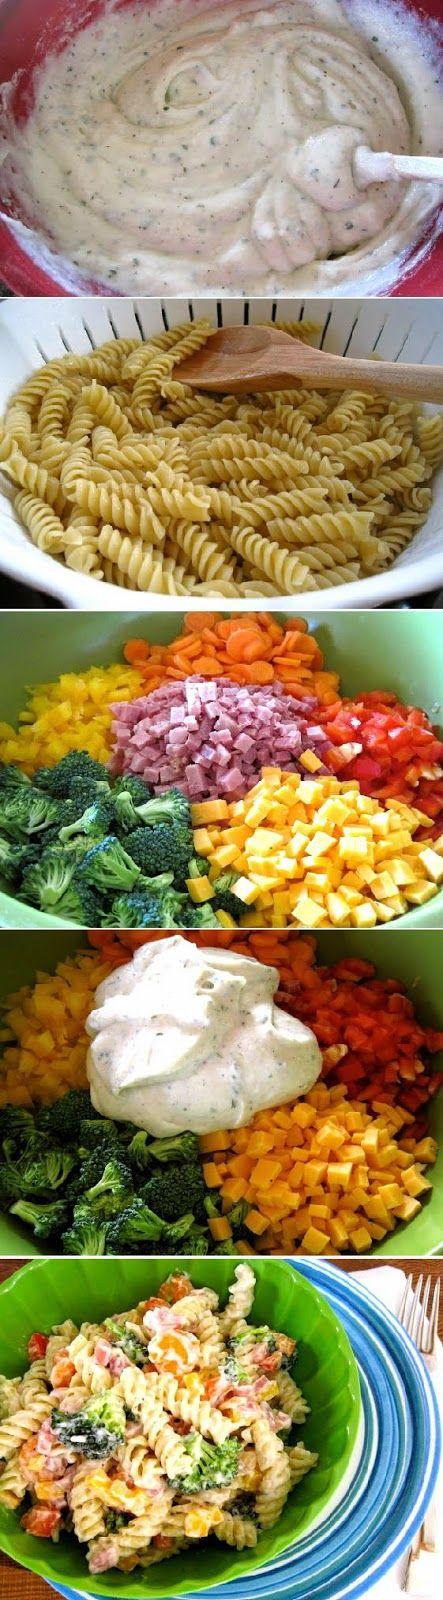 Pasta Salad colored